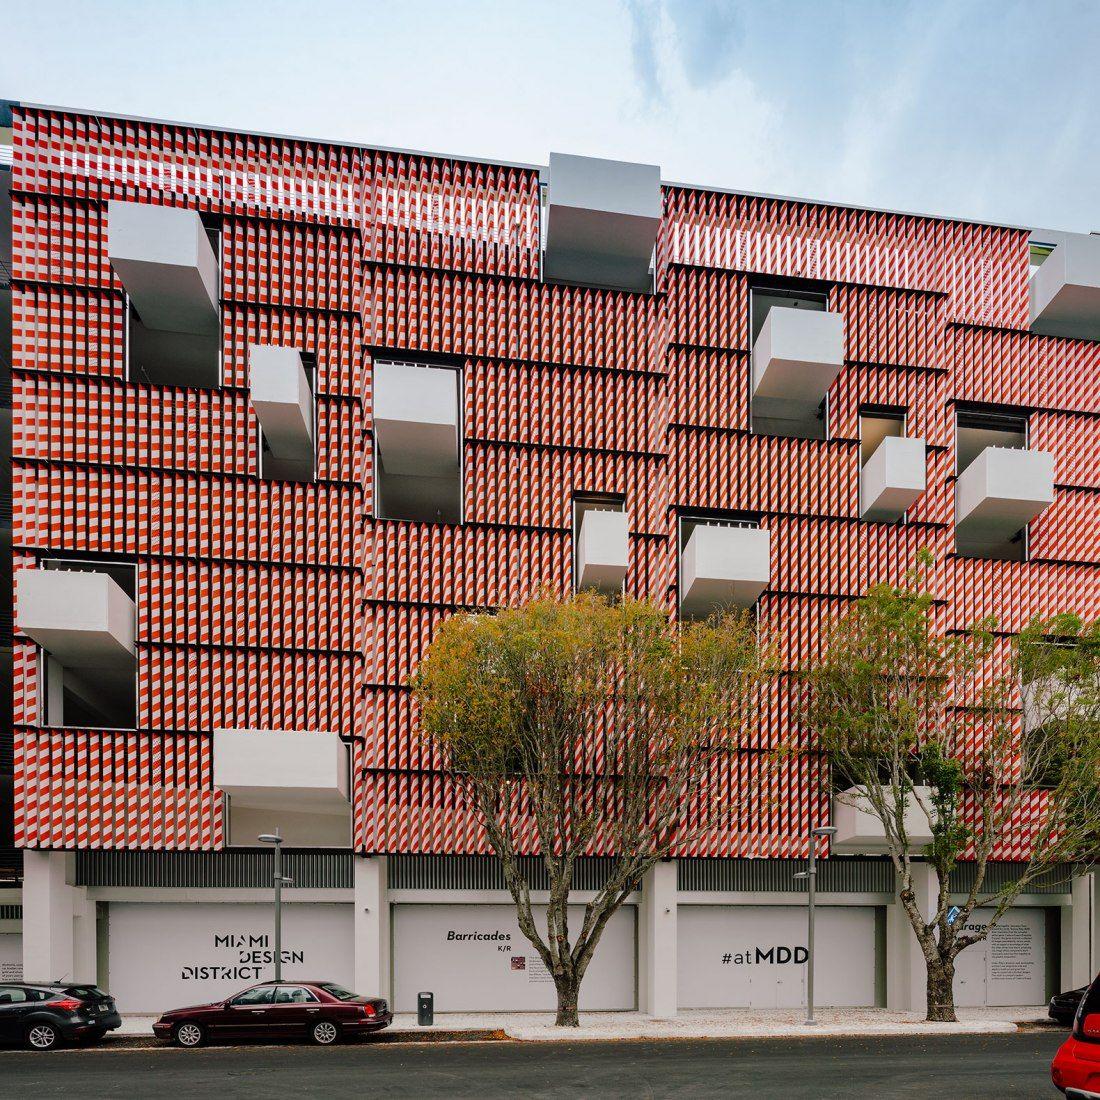 Barricades By K R Miami Museum Garage Photograph By Miguel De Guzman Imagen Subliminal Miami Design Design District Design